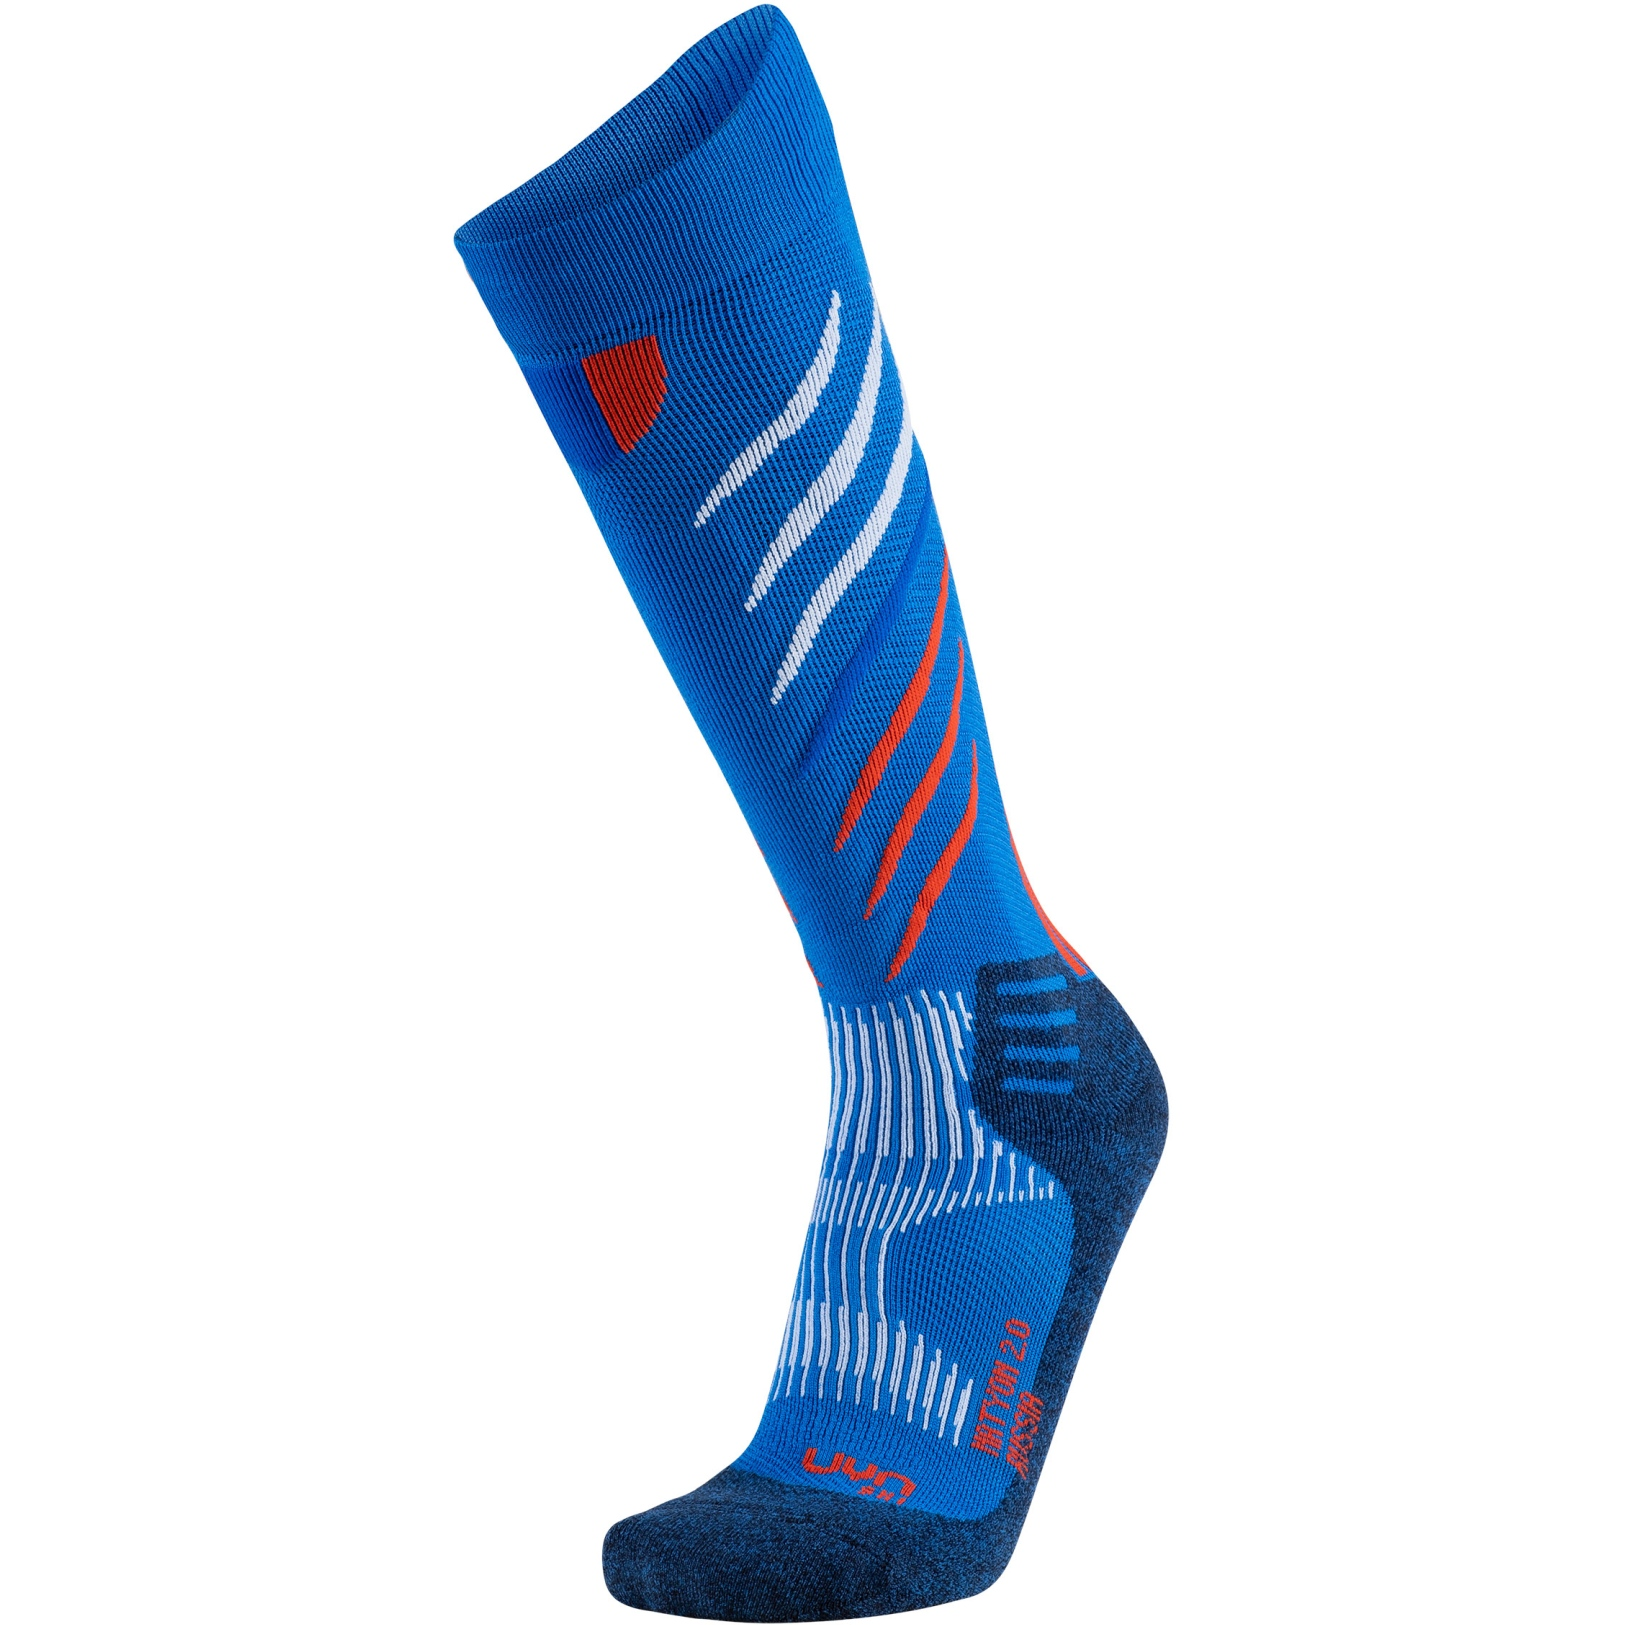 UYN Natyon 2.0 Men's Ski Socks - Russia